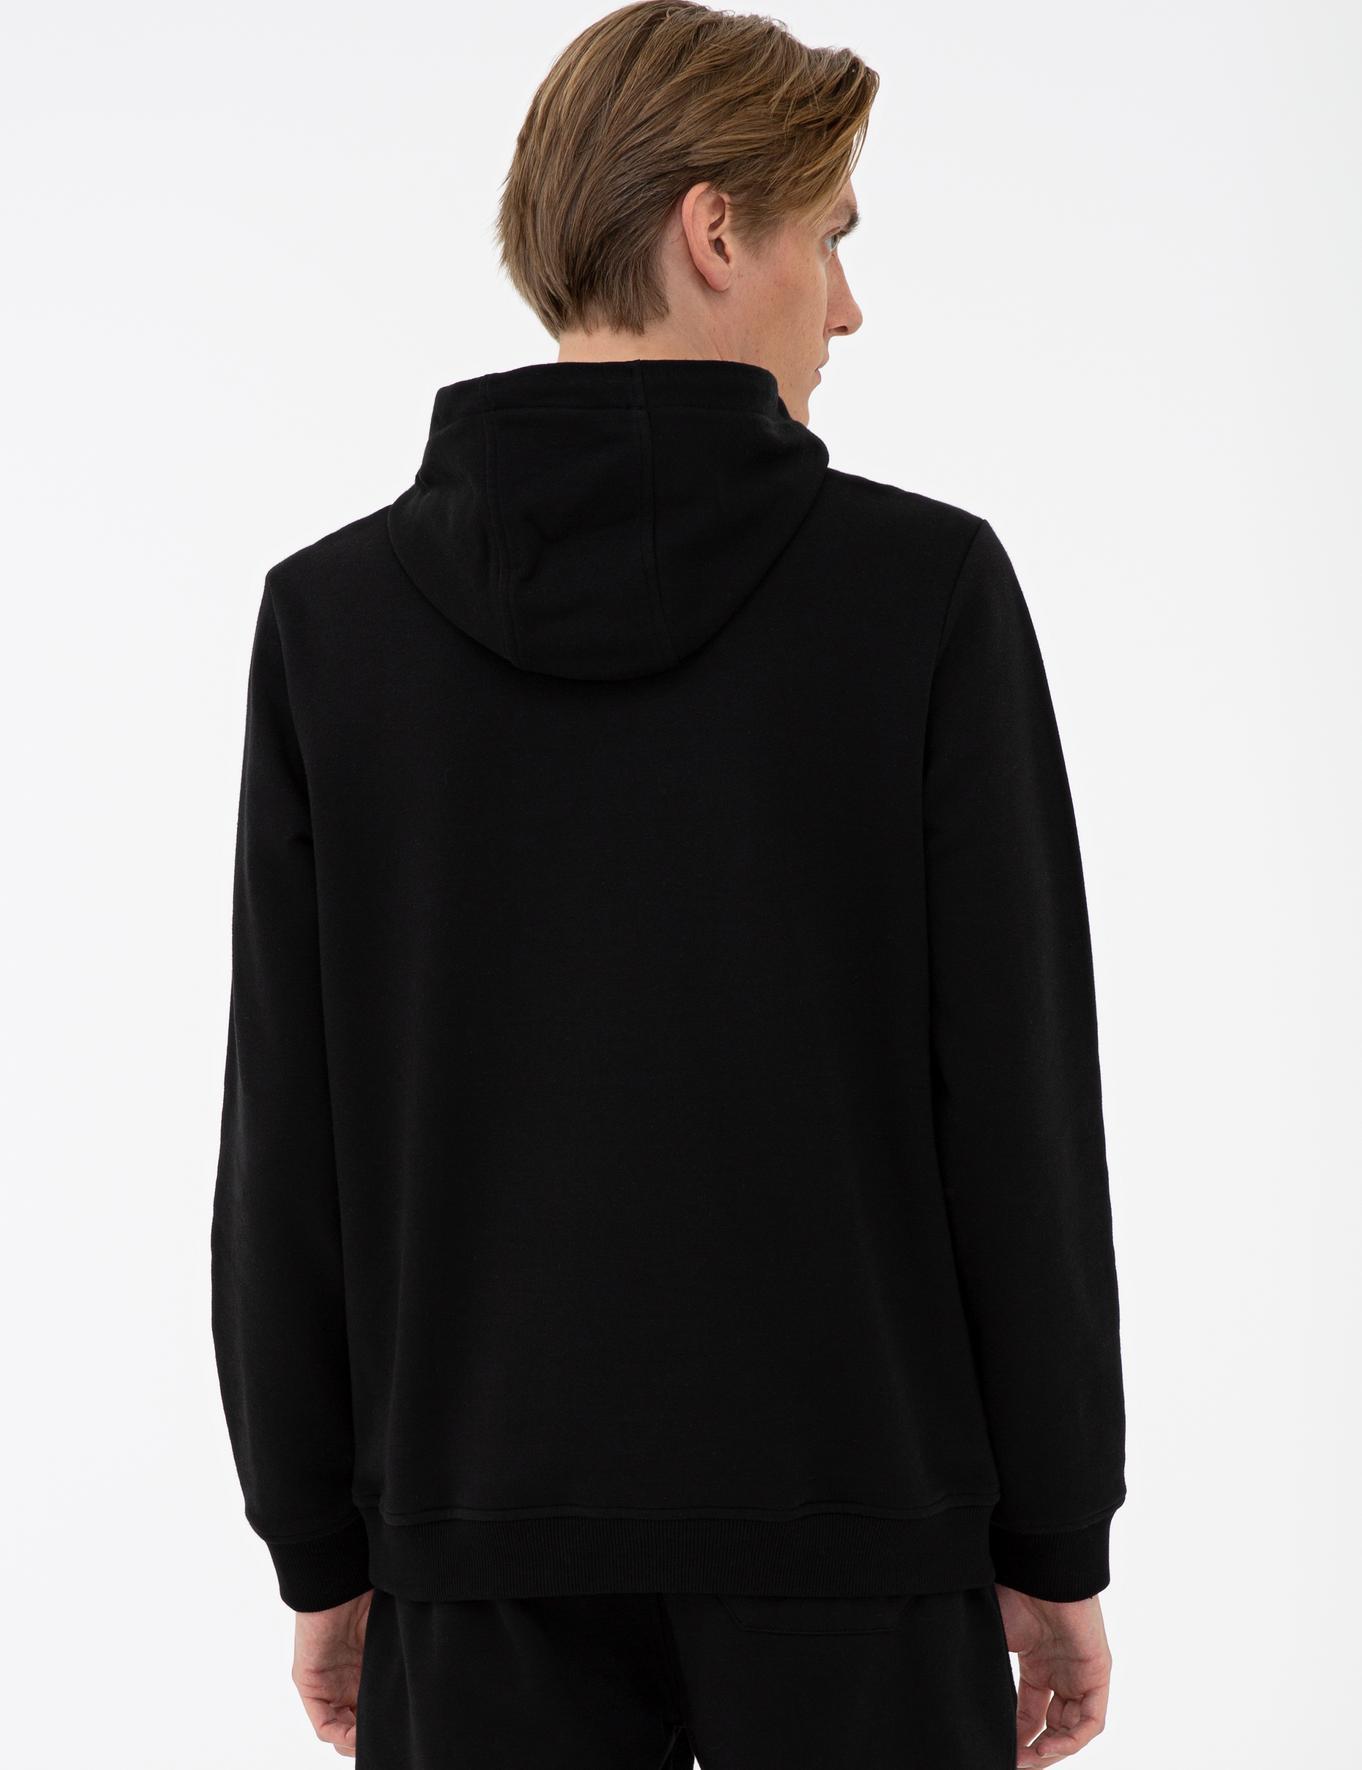 Siyah Standart Fit Sweatshirt - 50236094007